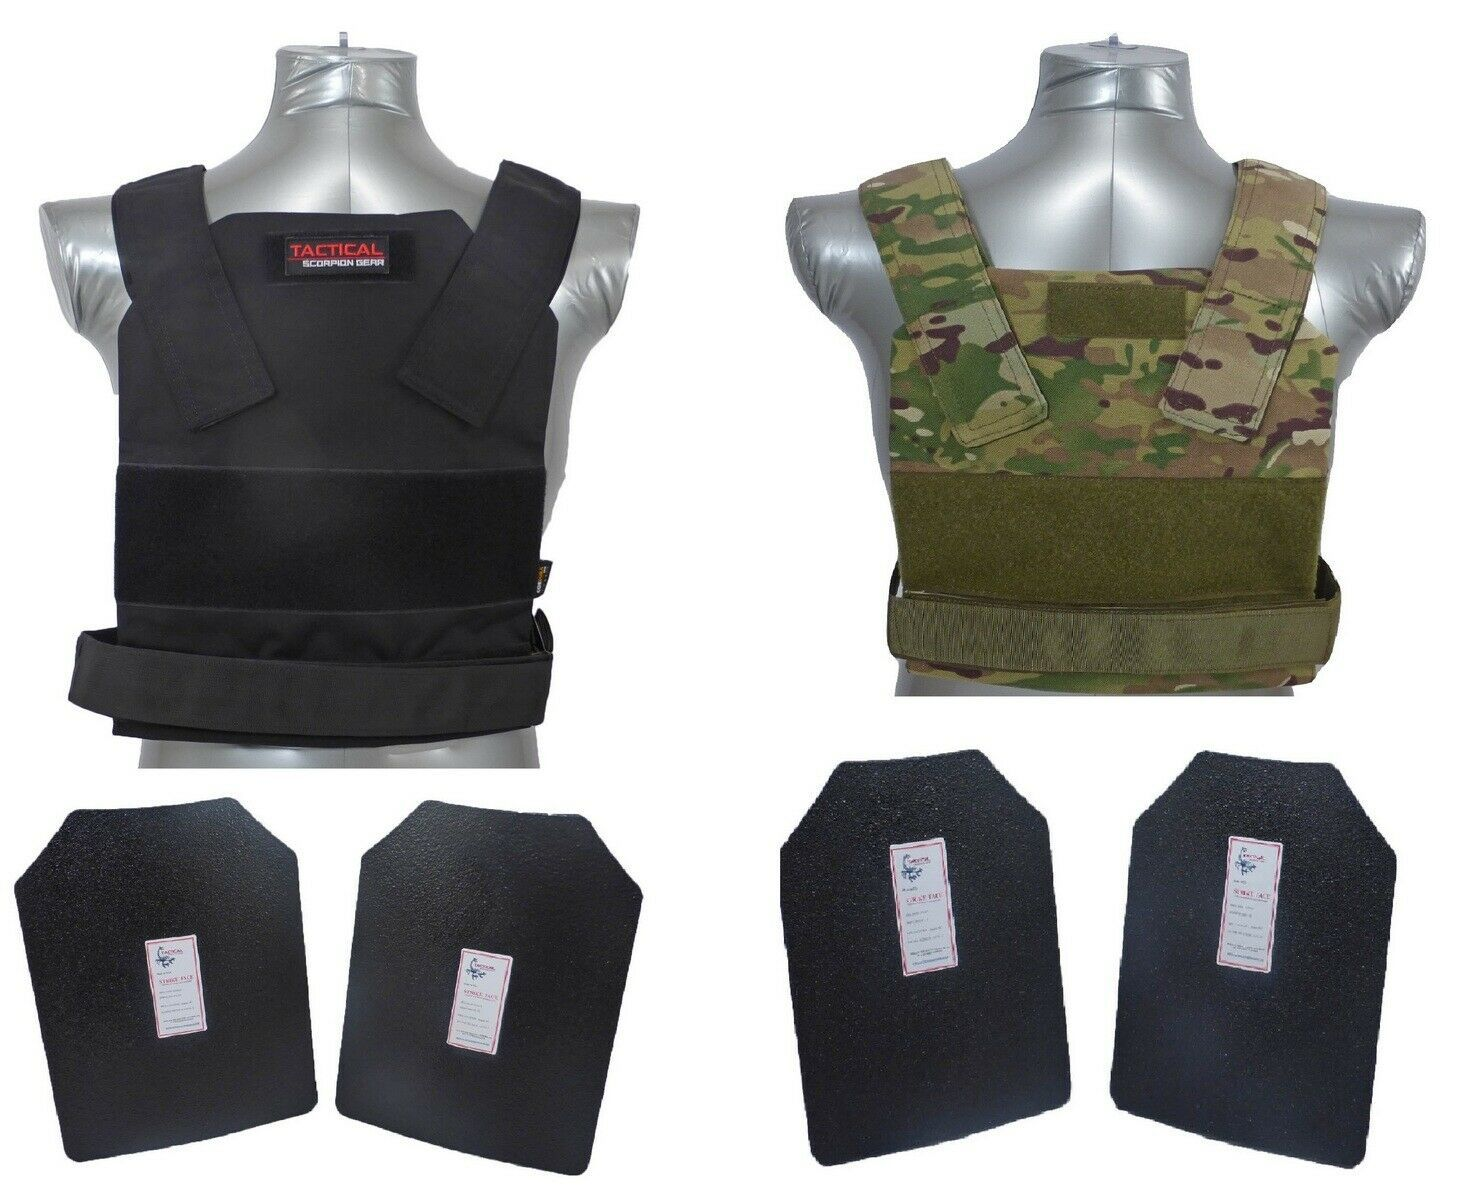 AR500 Body Armor Plates 11x14 Muircat Vest Tactical Scorpion 4Pc Level III+